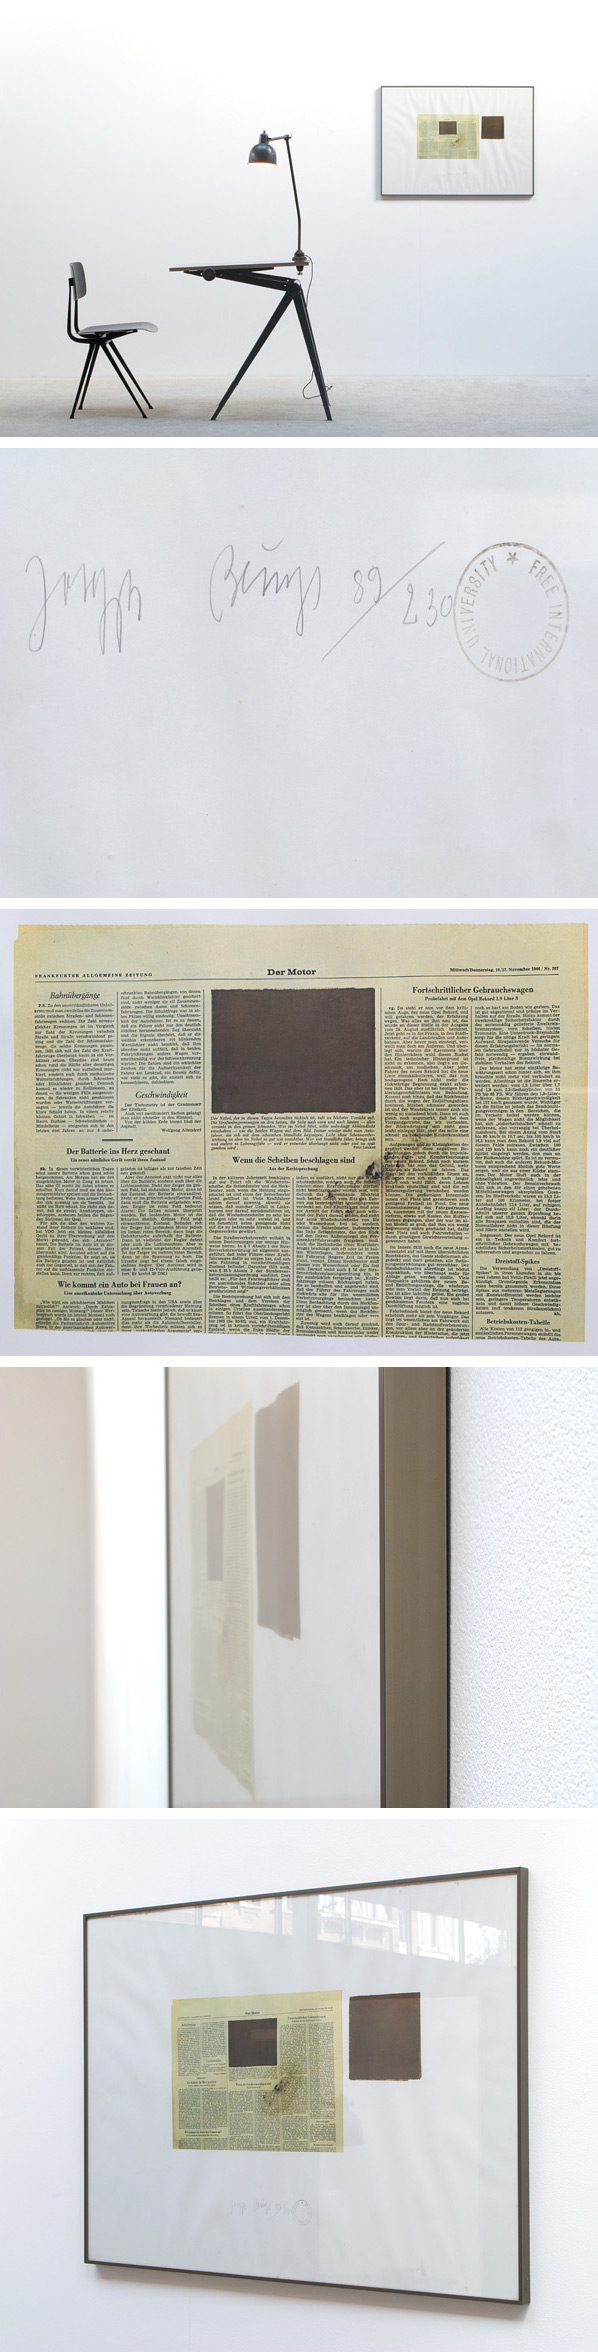 Joseph Beuys Der Motor Color offset lithograph Large